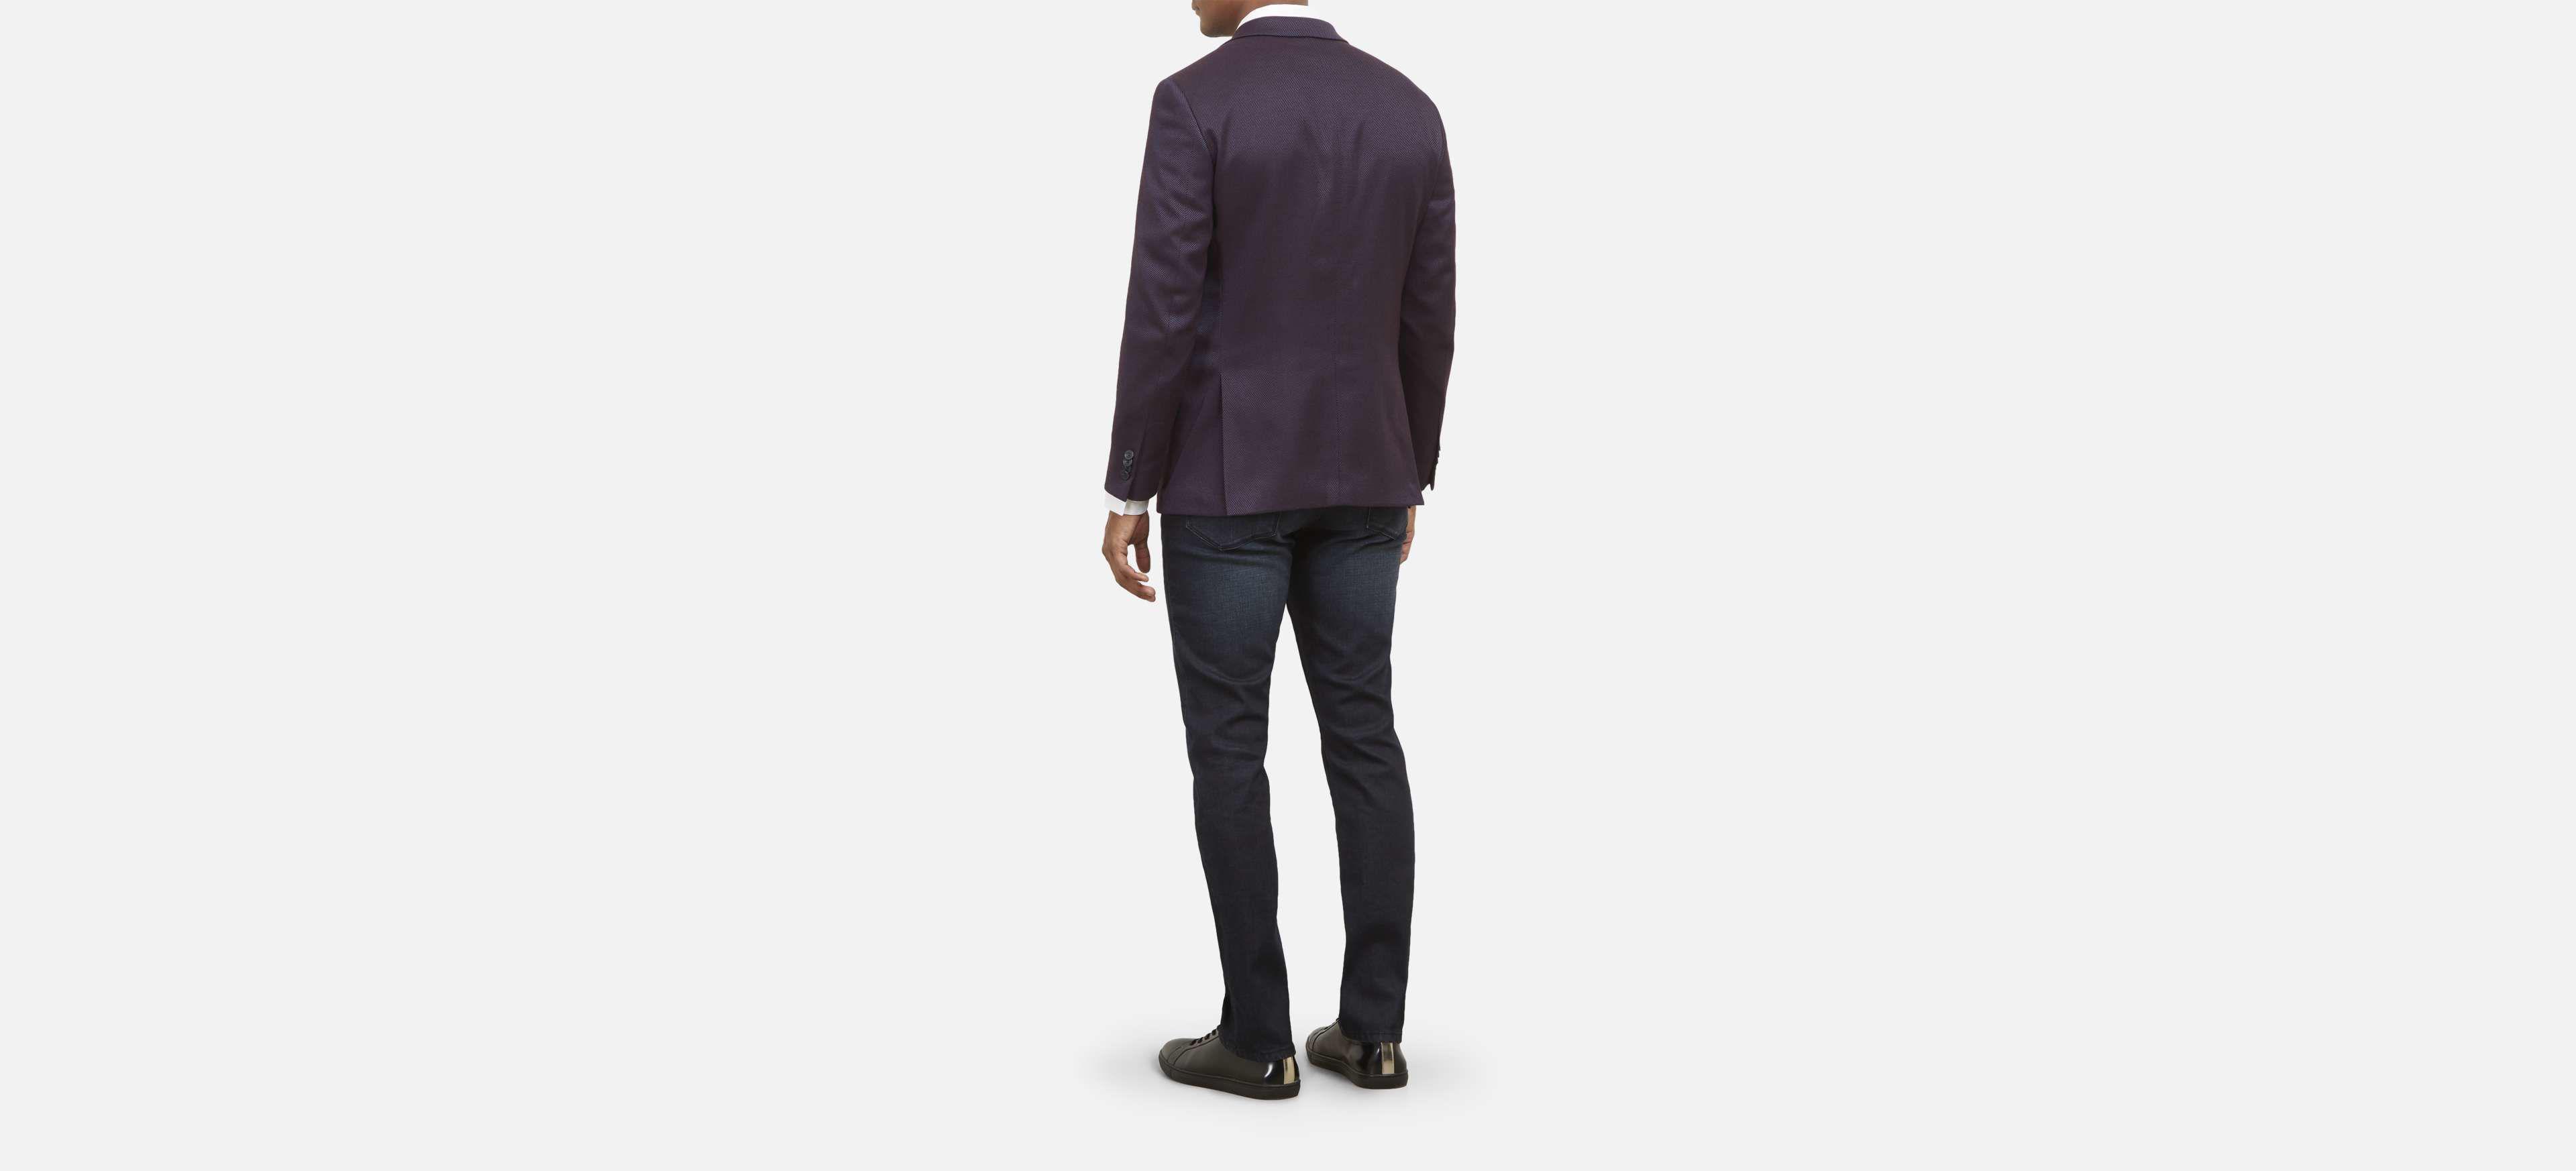 Kenneth Cole REACTION Men Classic Peacoat Bib Jacket Charcoal Blue